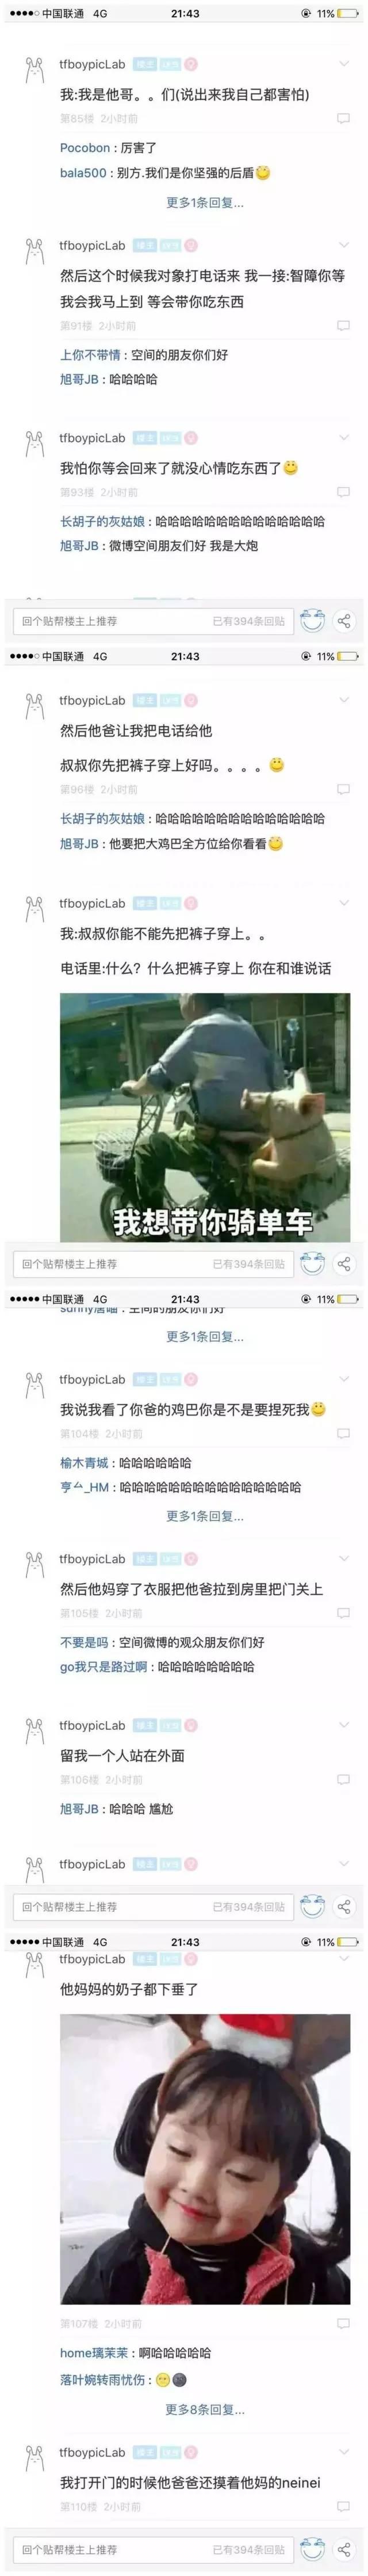 tucaoxingjun)授权发布去找对象结果他不在家撞见他爸妈在啪啪哈哈